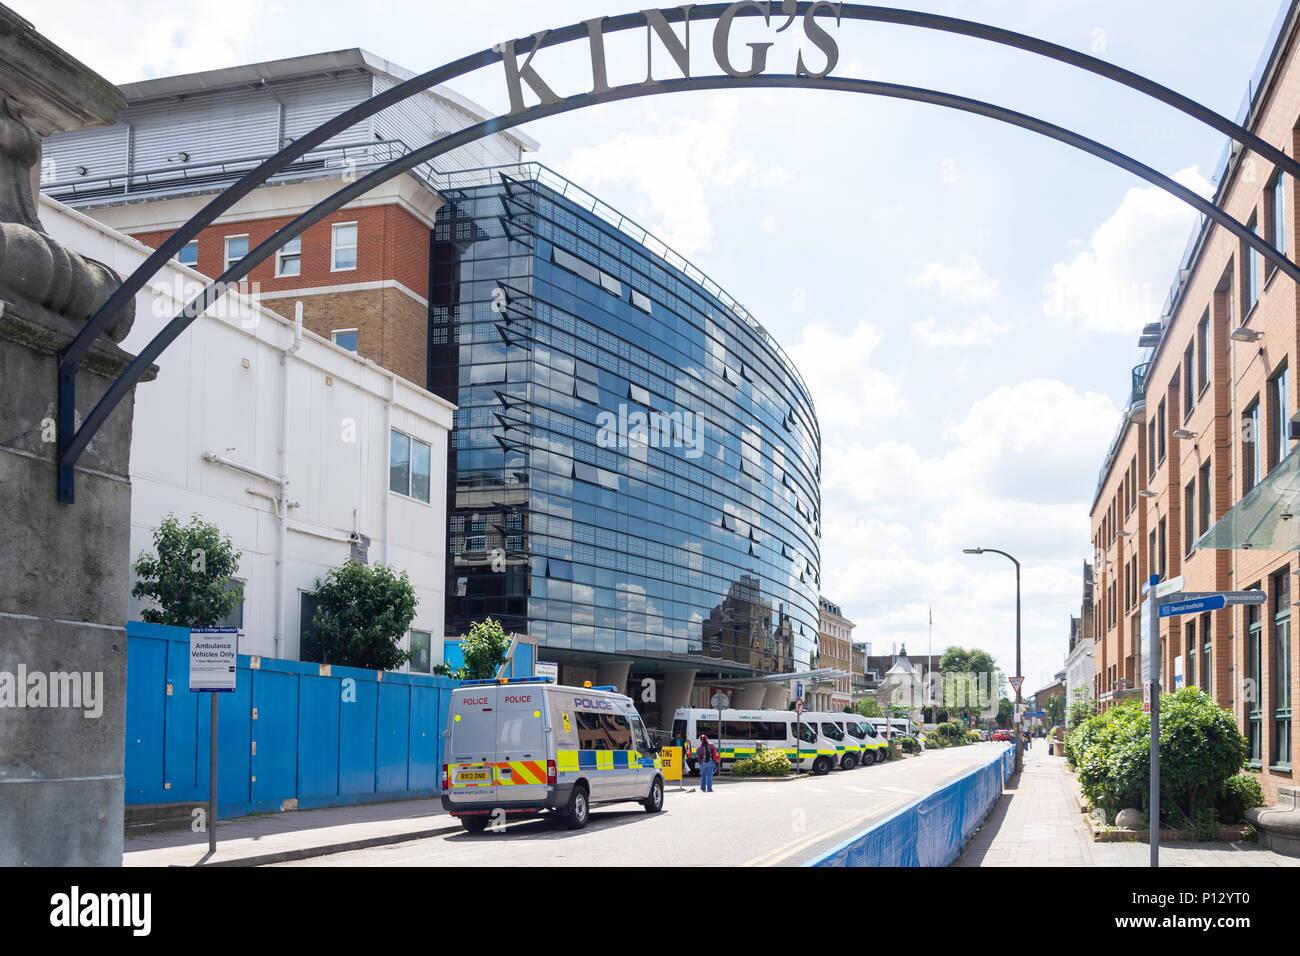 Eingang von King's College Hospital, Dänemark Hill, Camberwell, Londoner Stadtteil Southwark, Greater London, England, Vereinigtes Königreich Stockbild